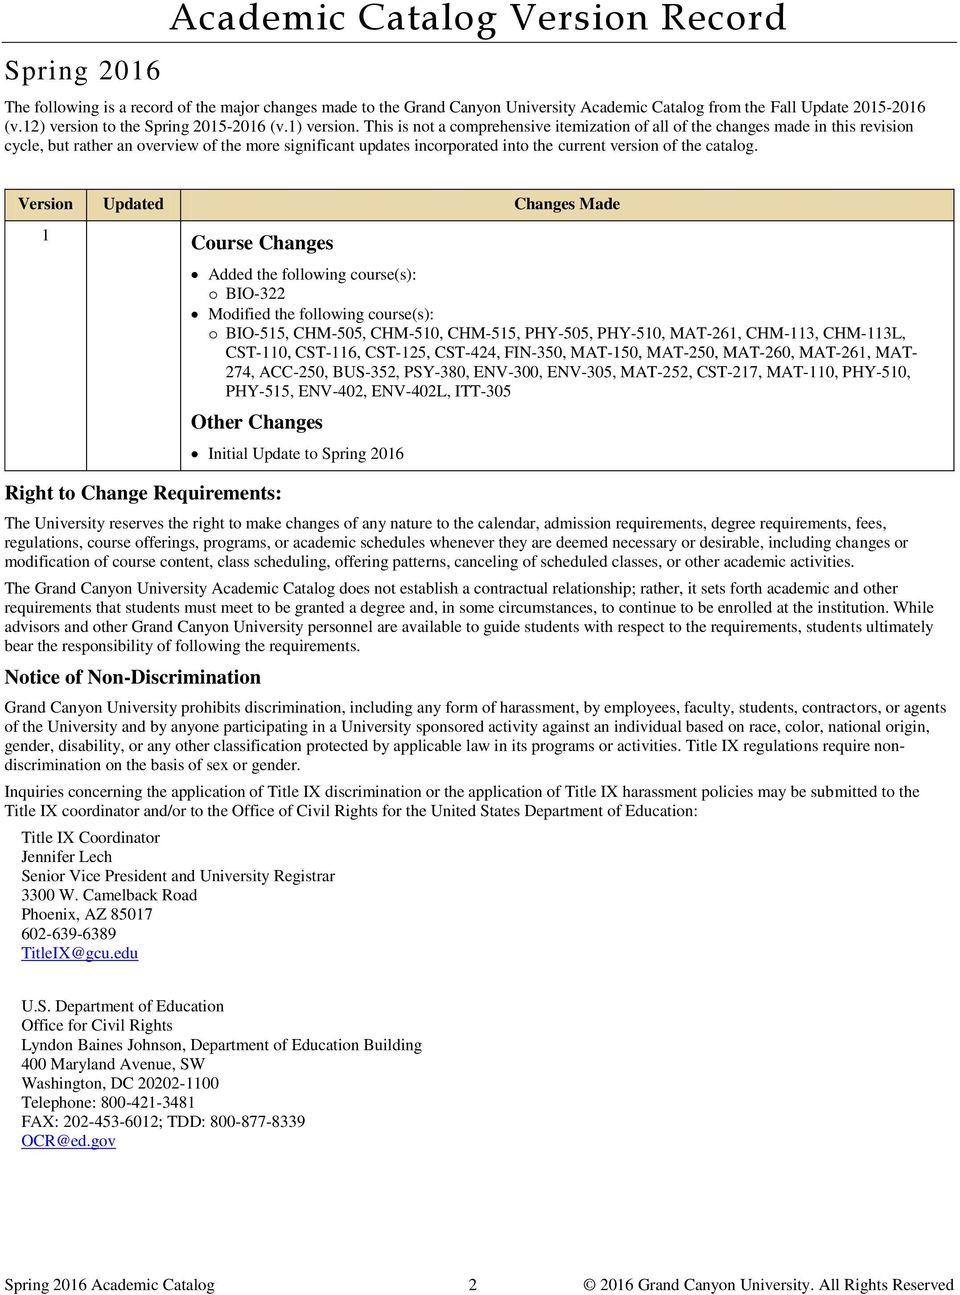 Grand Canyon University Academic Catalog – Pdf Free Download For Canyon University Vacation Calender